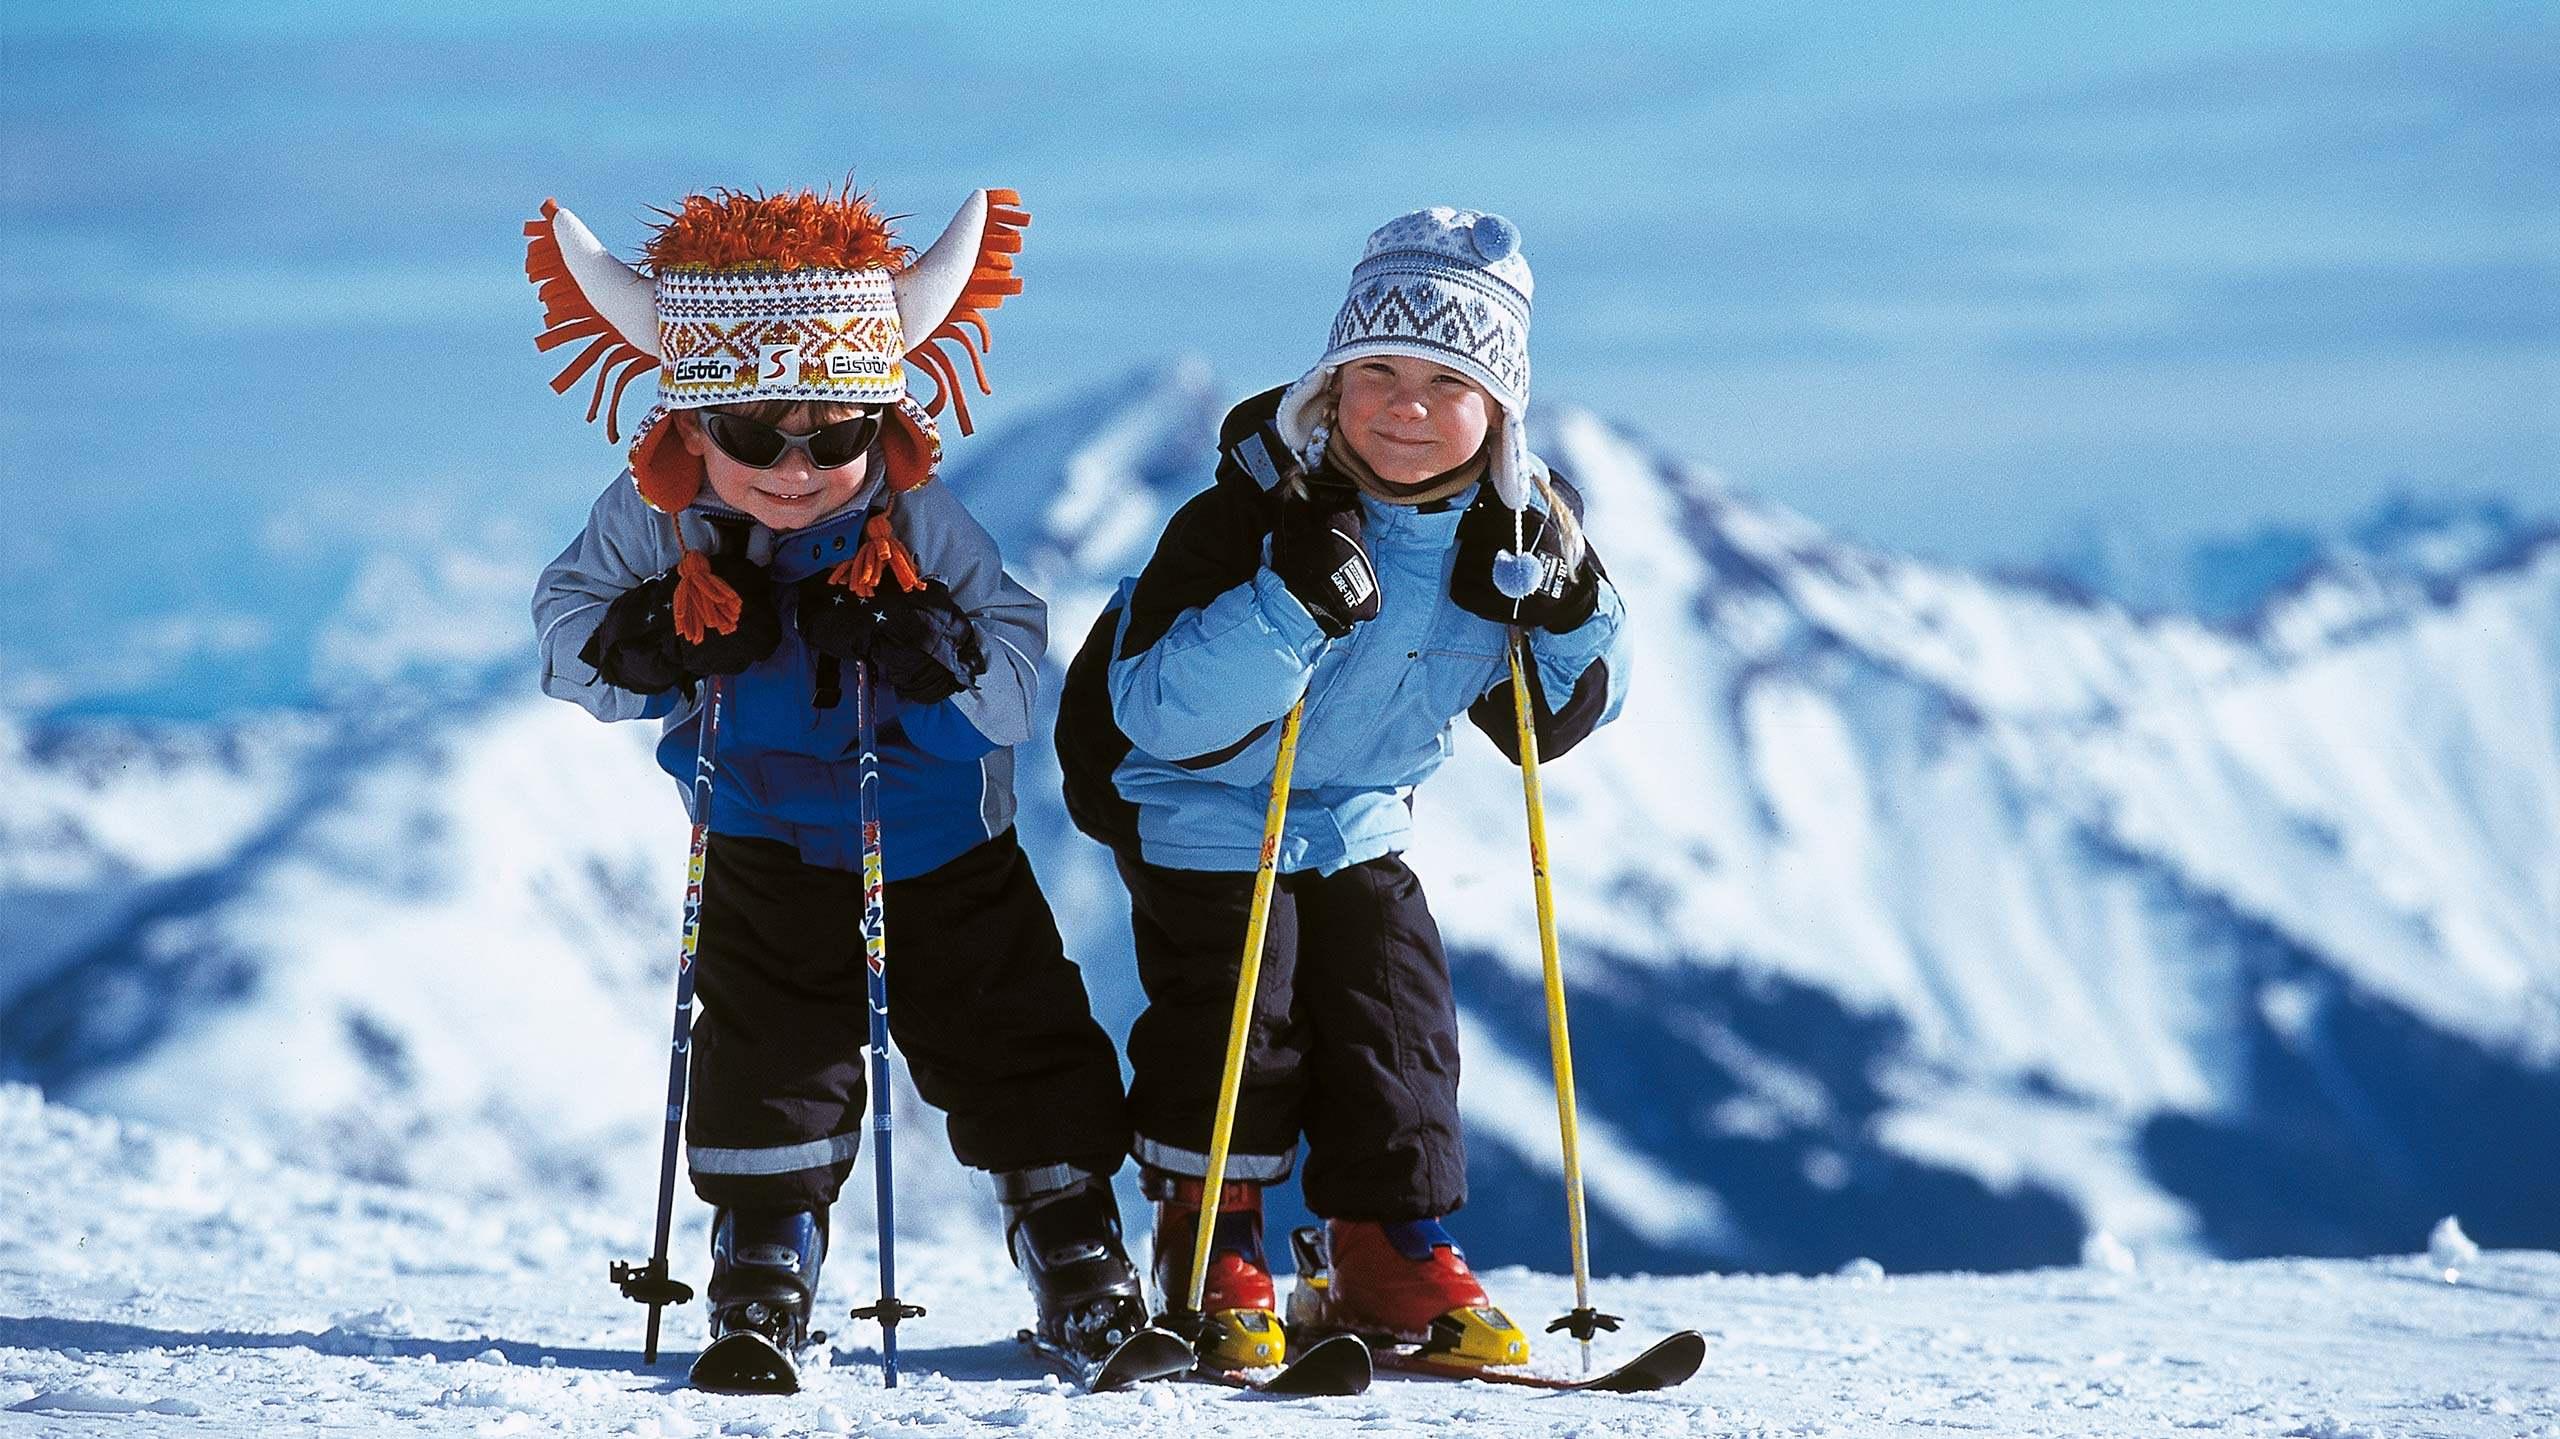 kinder-skifahren-alpina-rauris